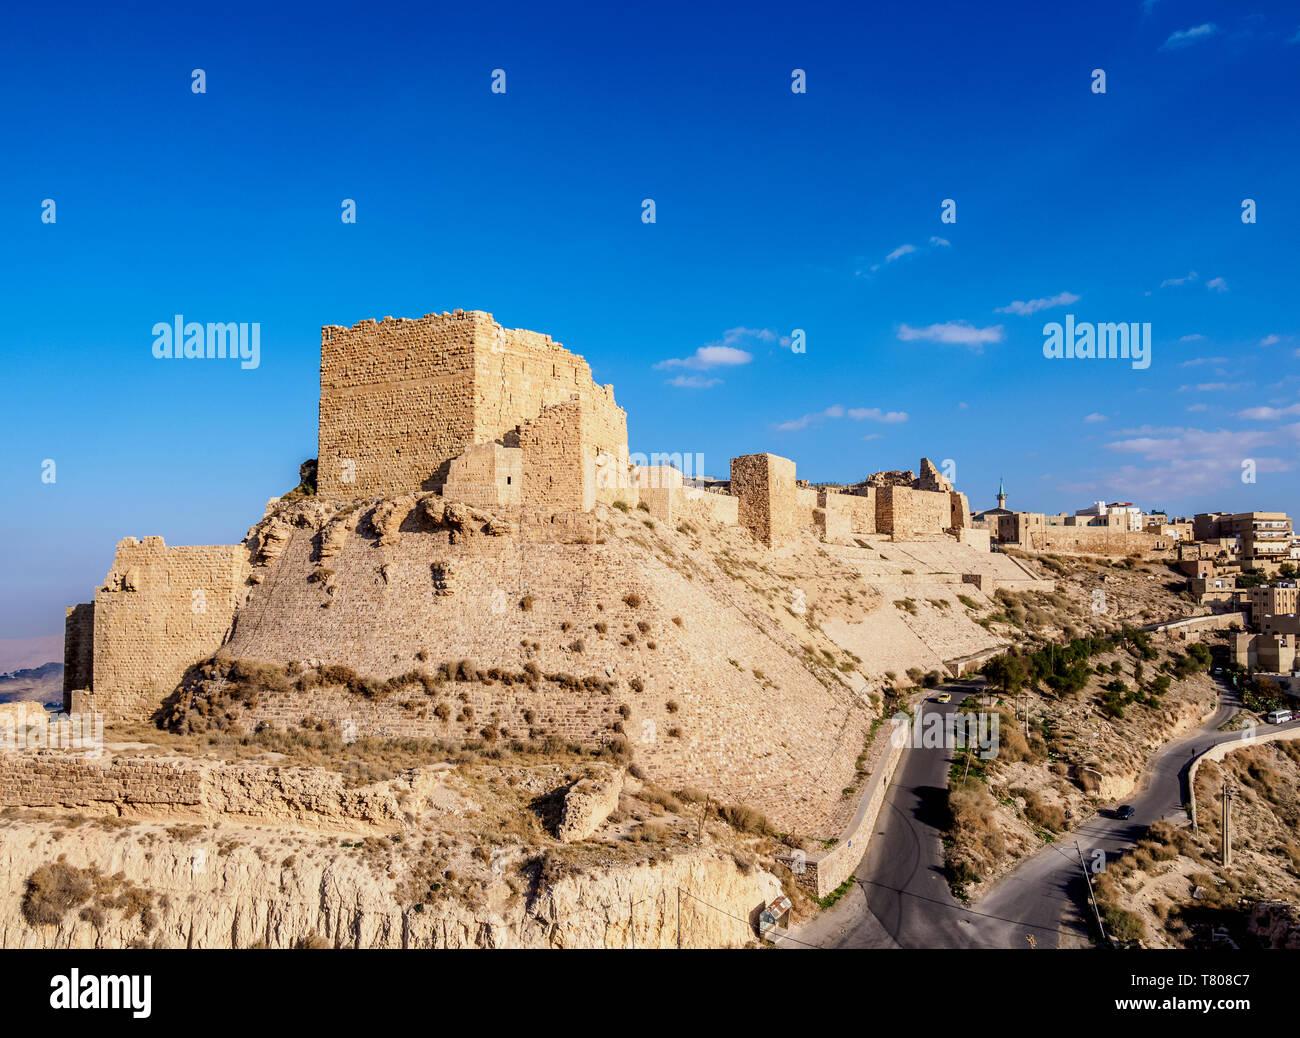 Kerak Castle, Al-Karak, Karak Governorate, Jordan, Middle East Stock Photo